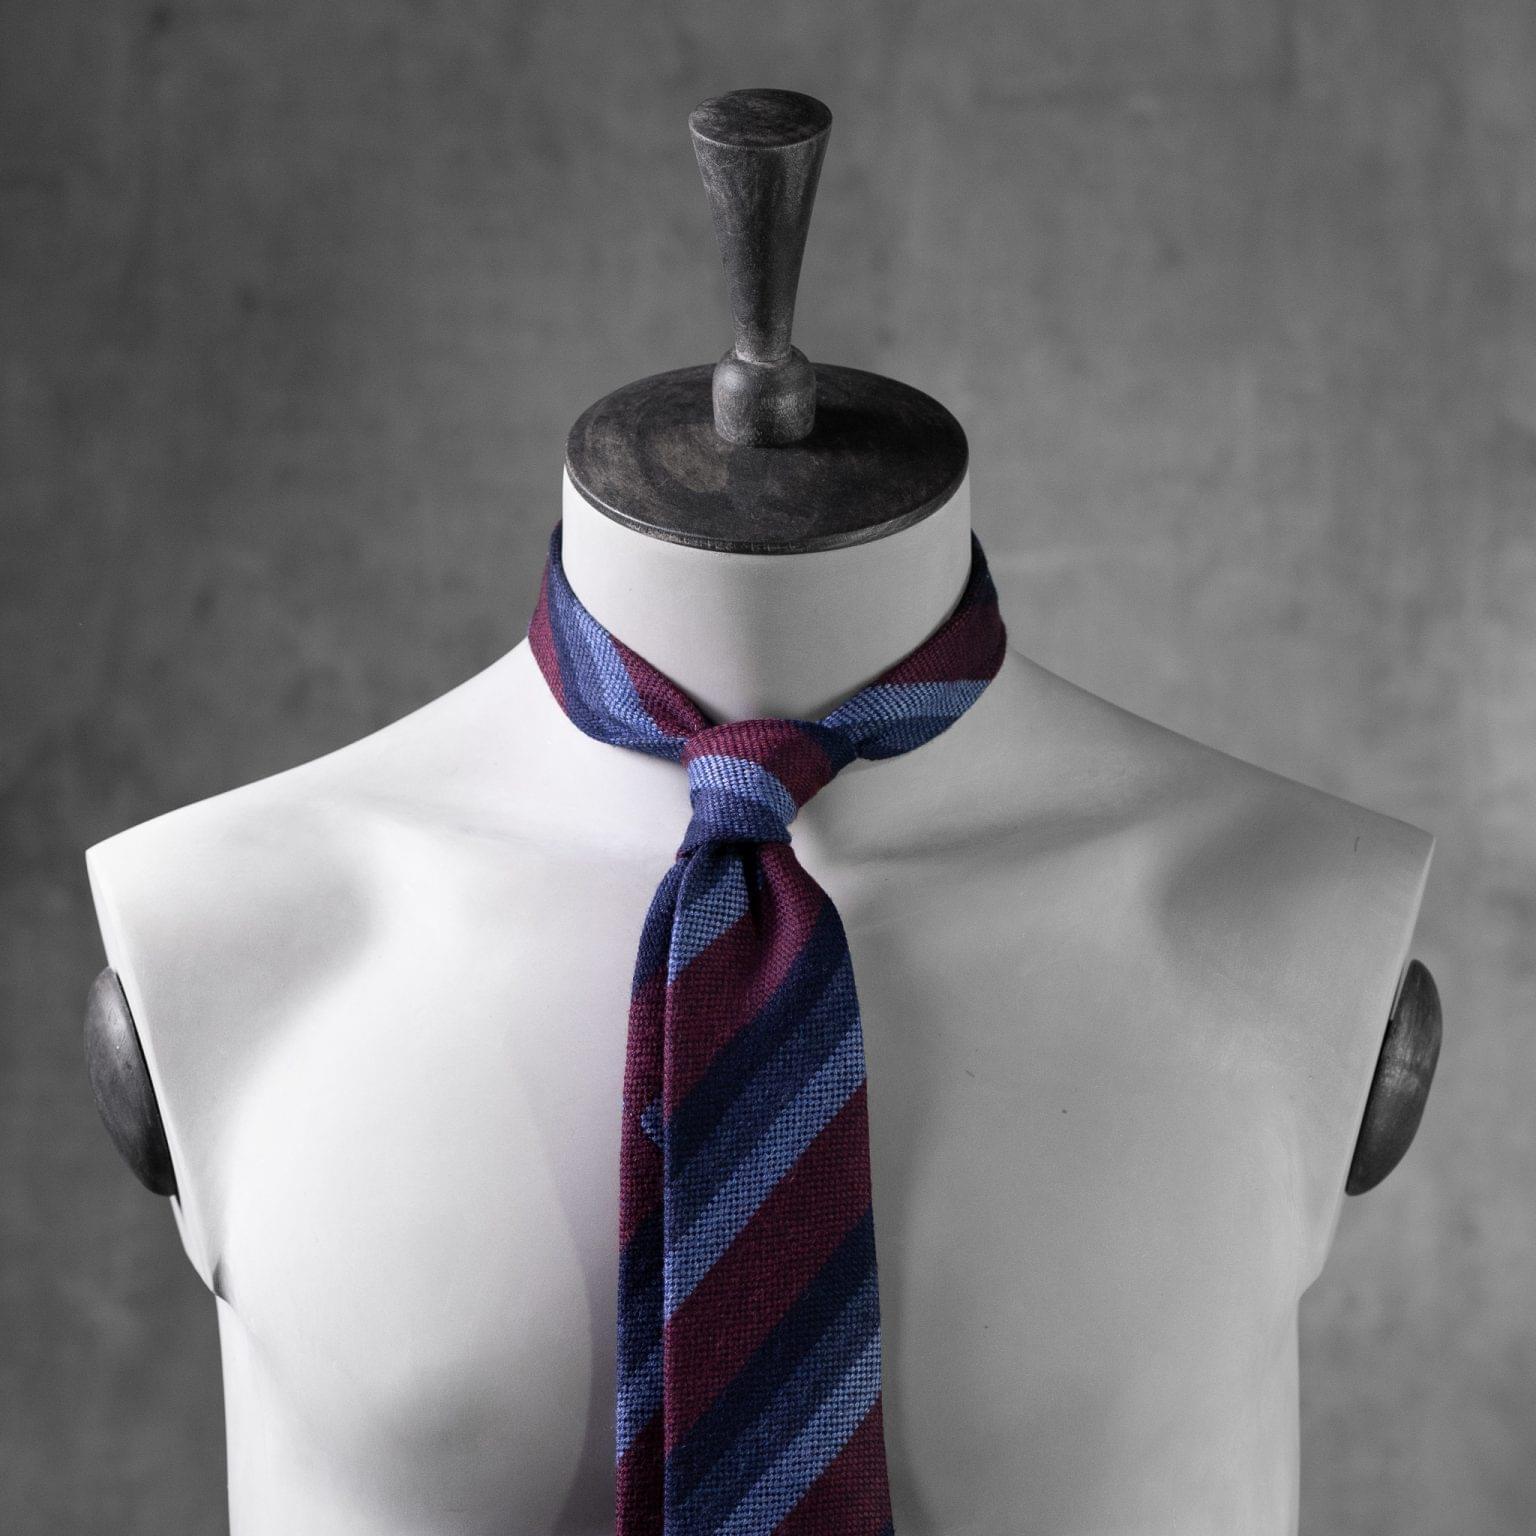 WOOL-LANA-0512-Tie-Initials-Corbata-Iniciales-The-Seelk-3